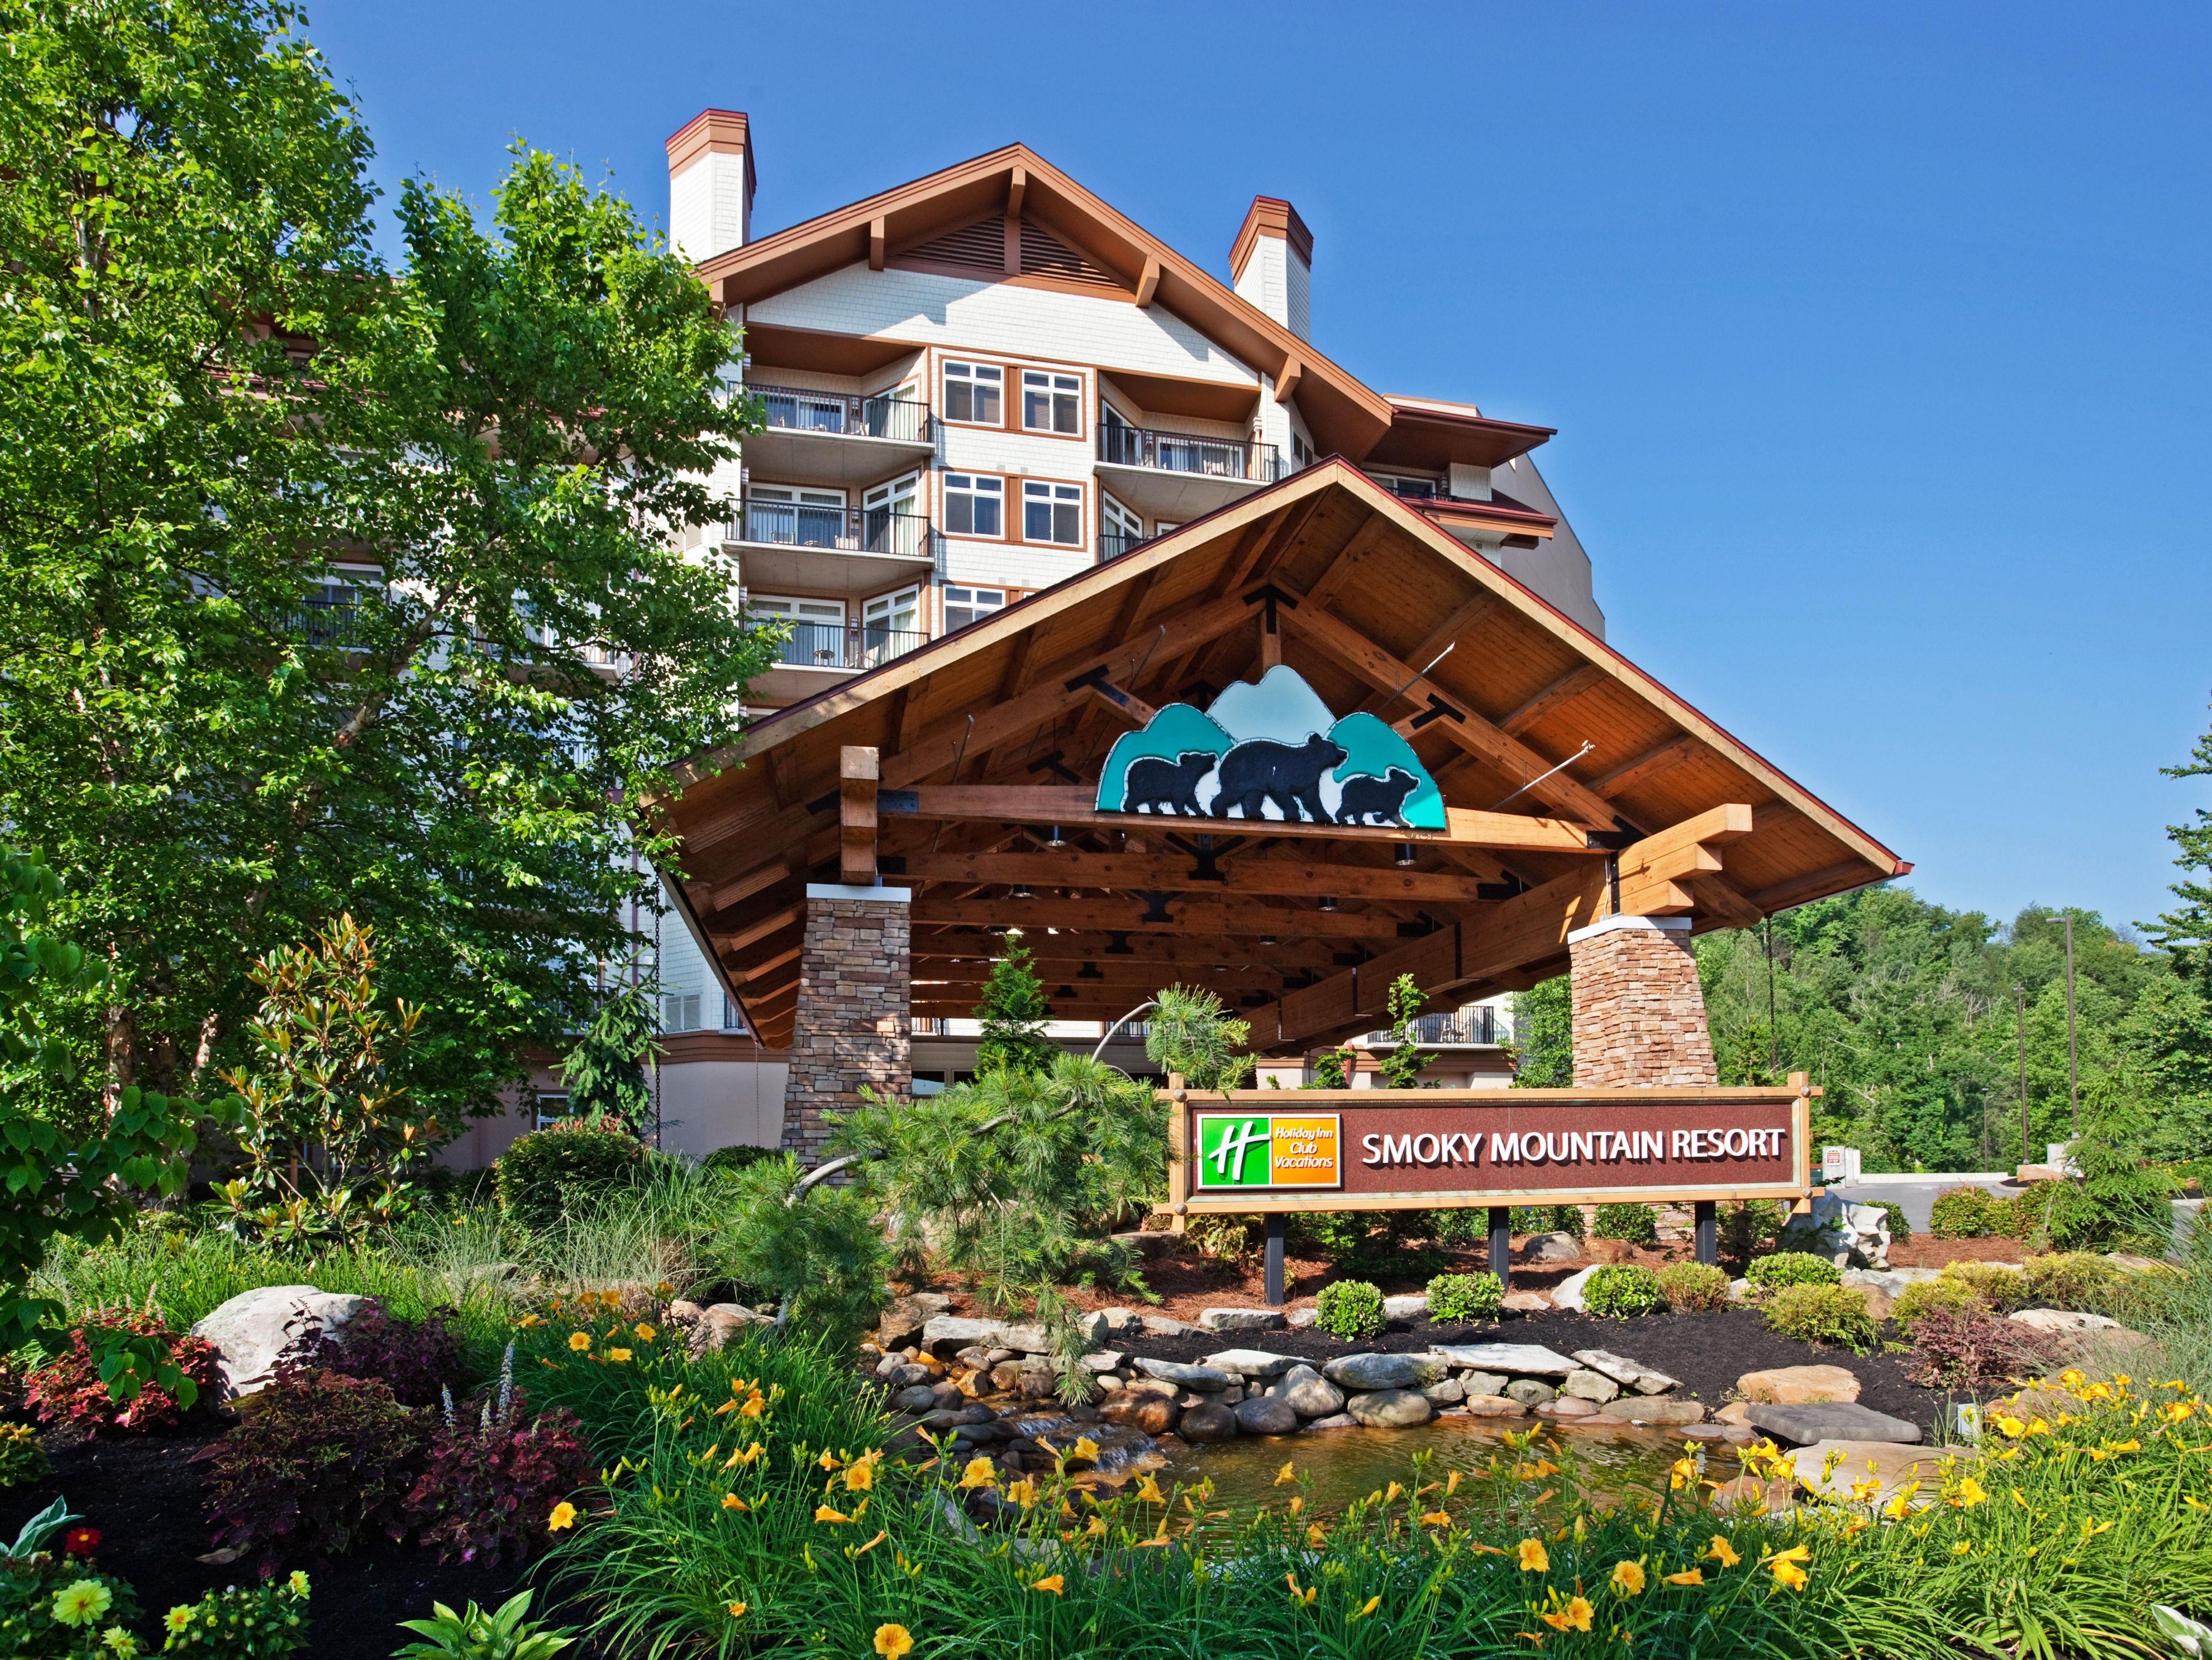 Holiday Inn Club Vacations Smoky Mountain Resort Hotel by IHG